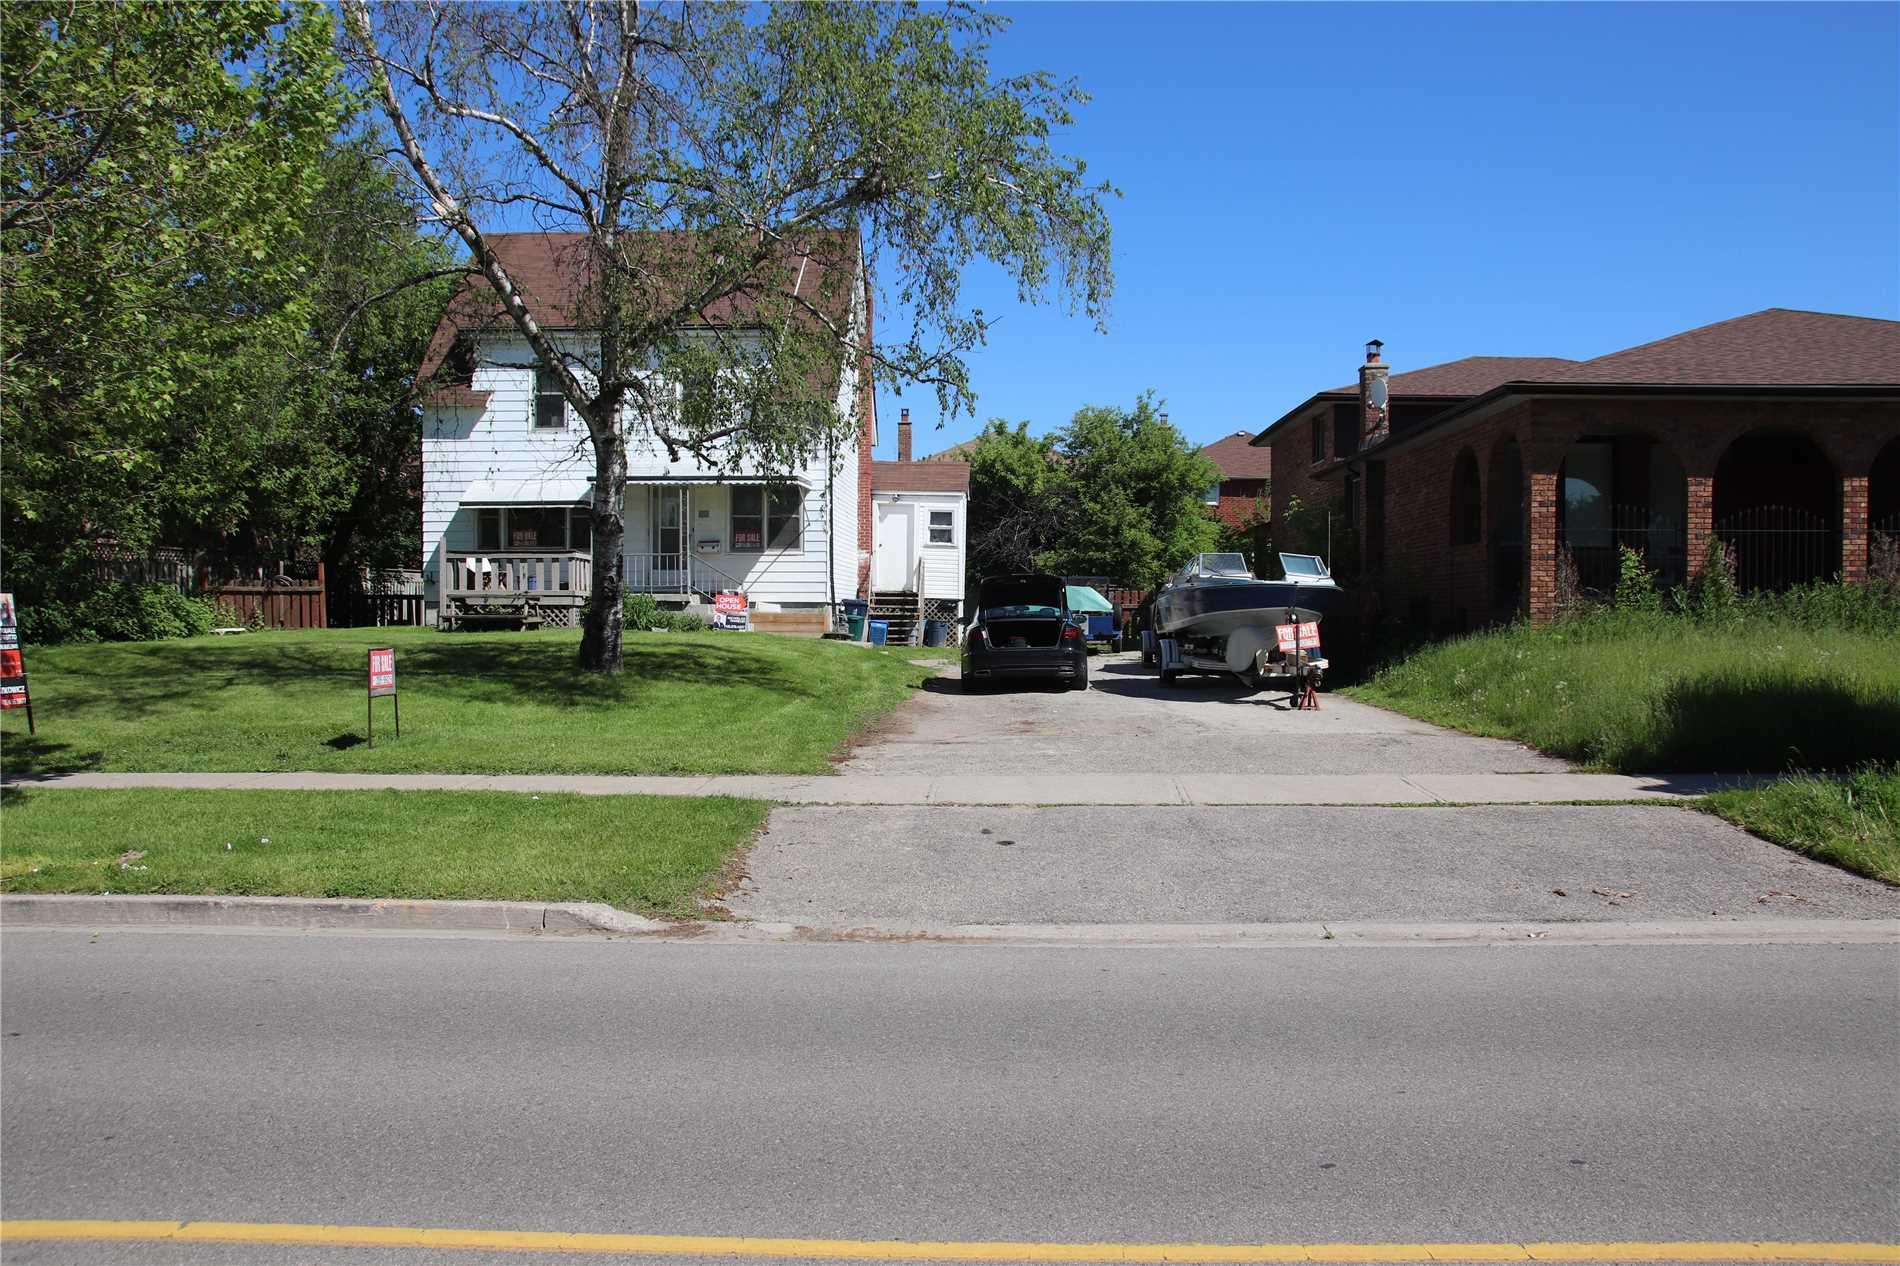 154 Crestwood Rd, Vaughan